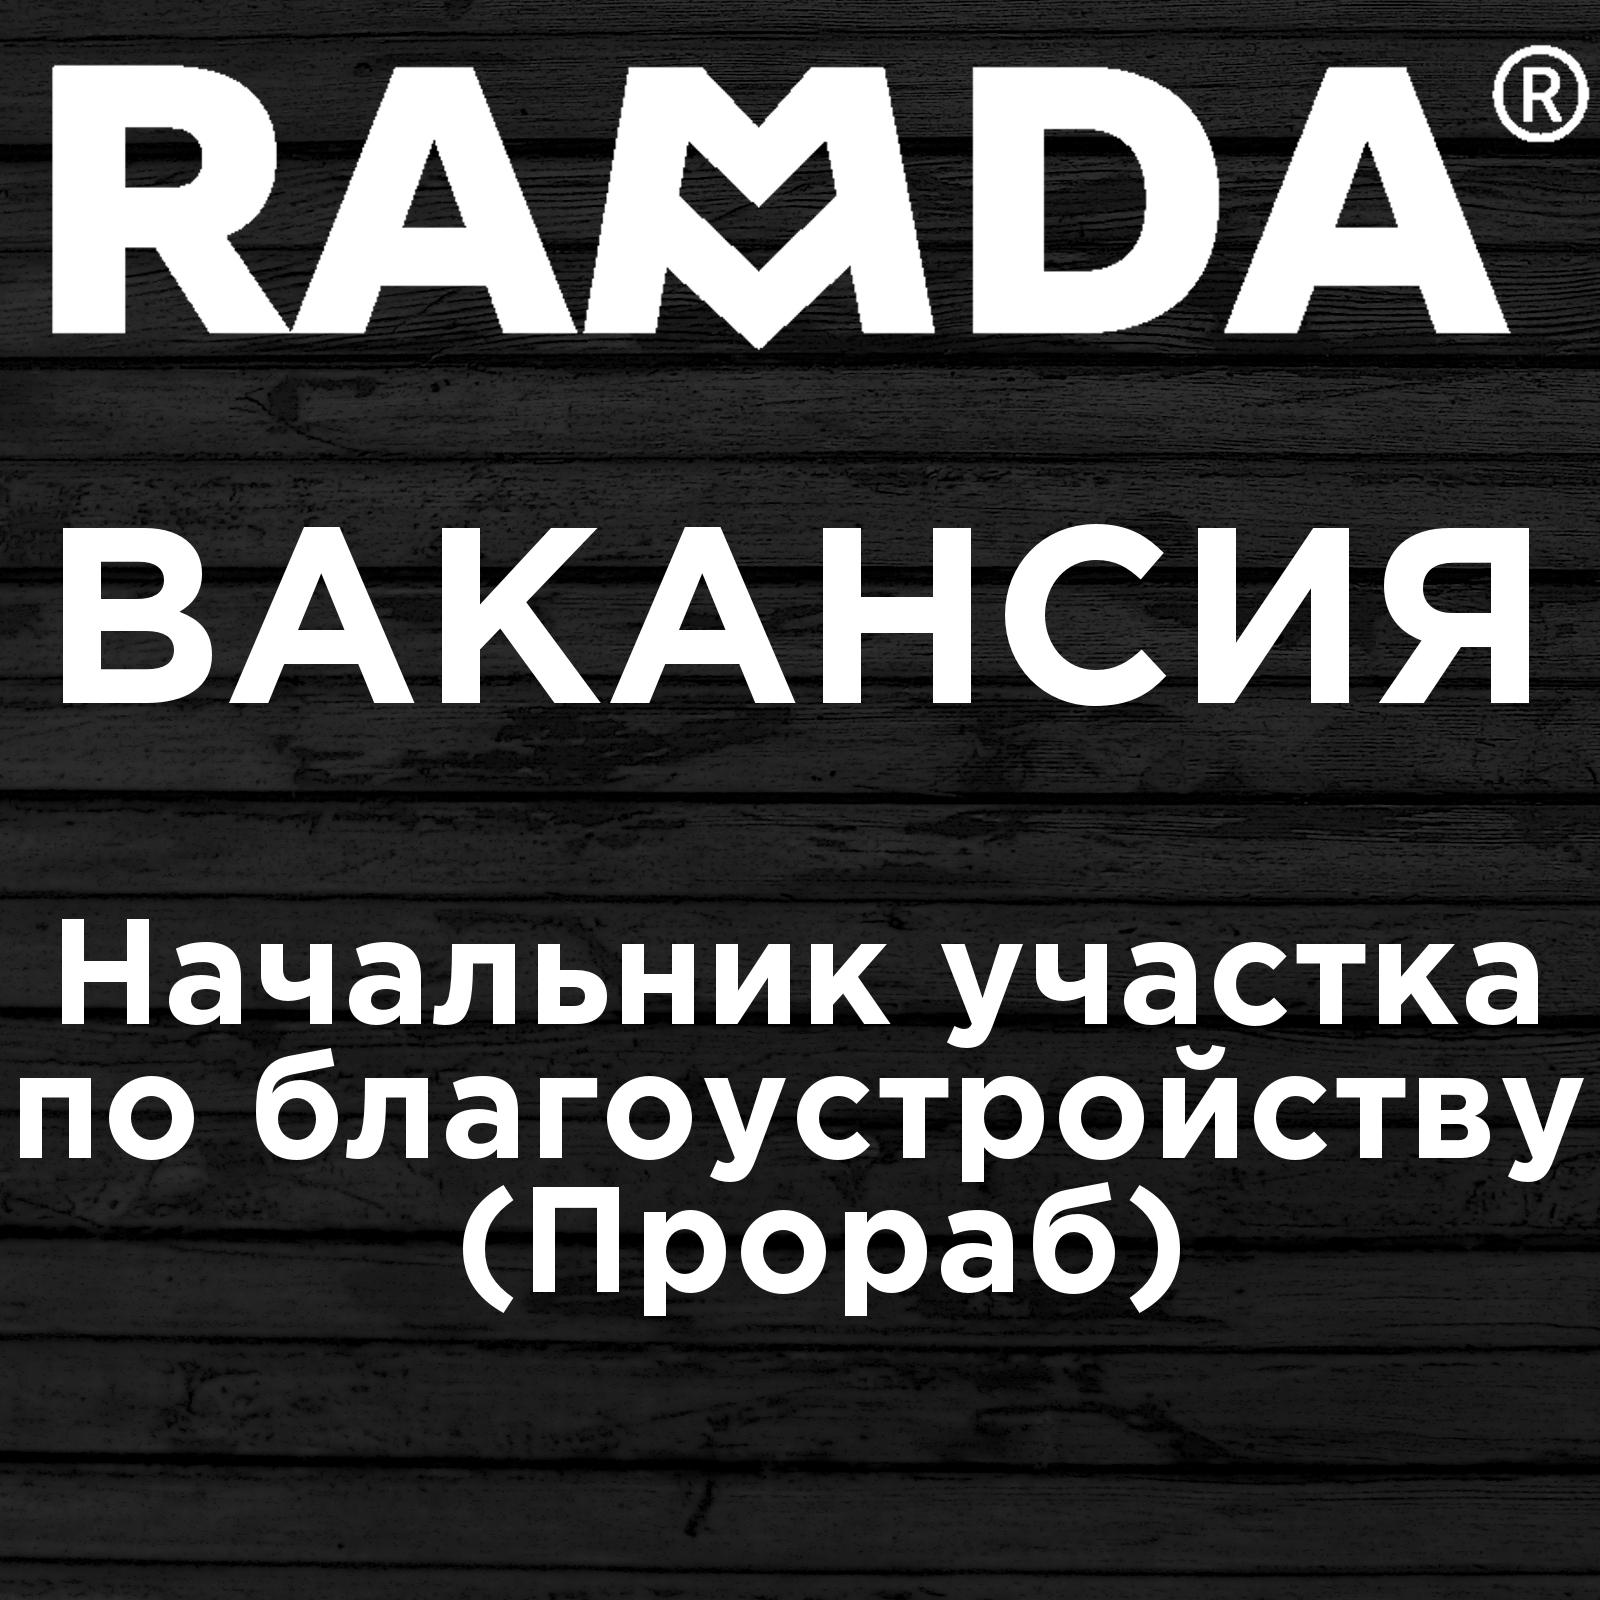 Вакансия прораб в Новосибирске от RAMDA